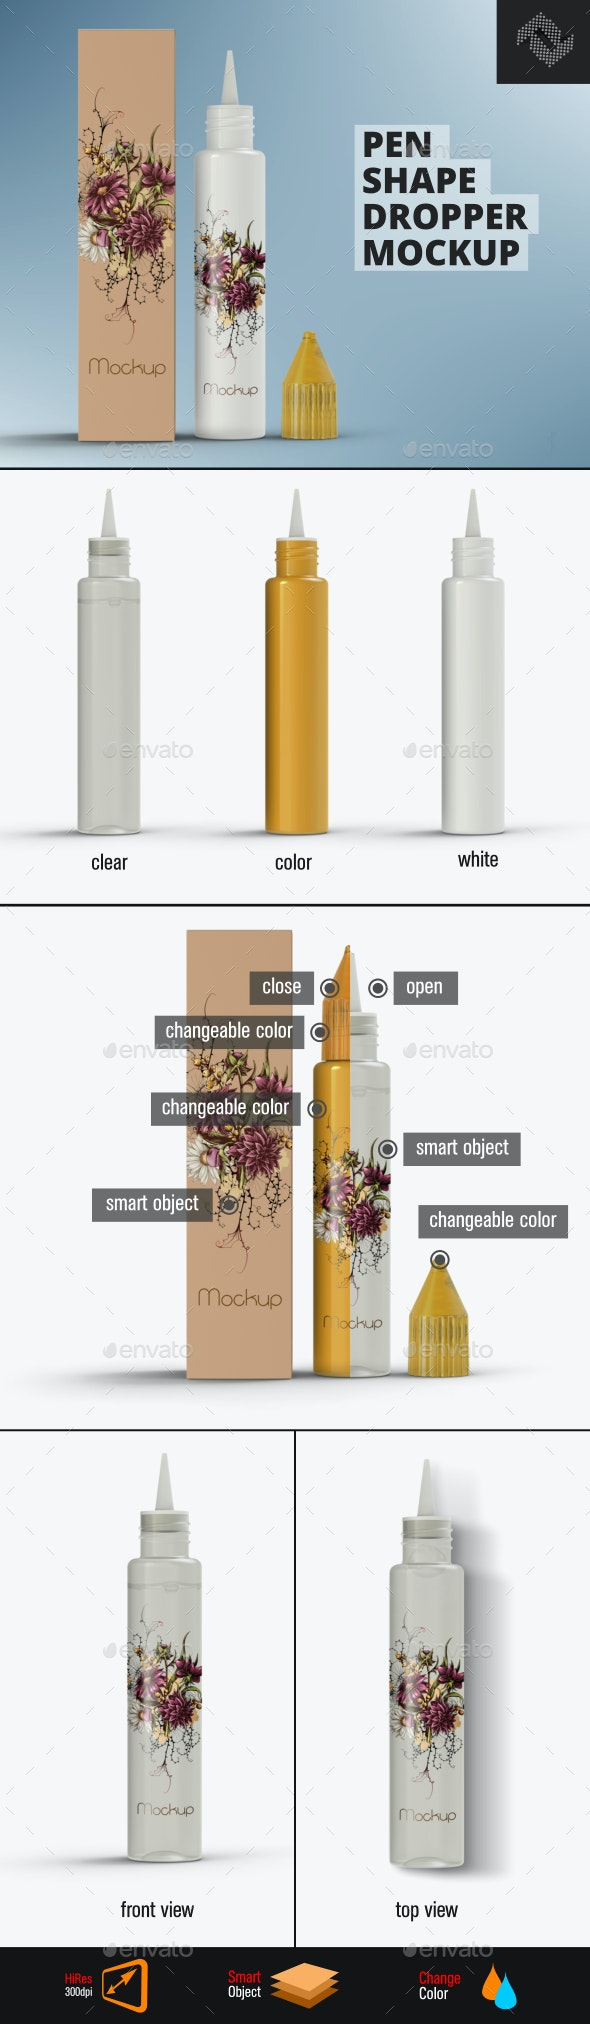 Pen Shape Dropper Mockup - Packaging Product Mock-Ups